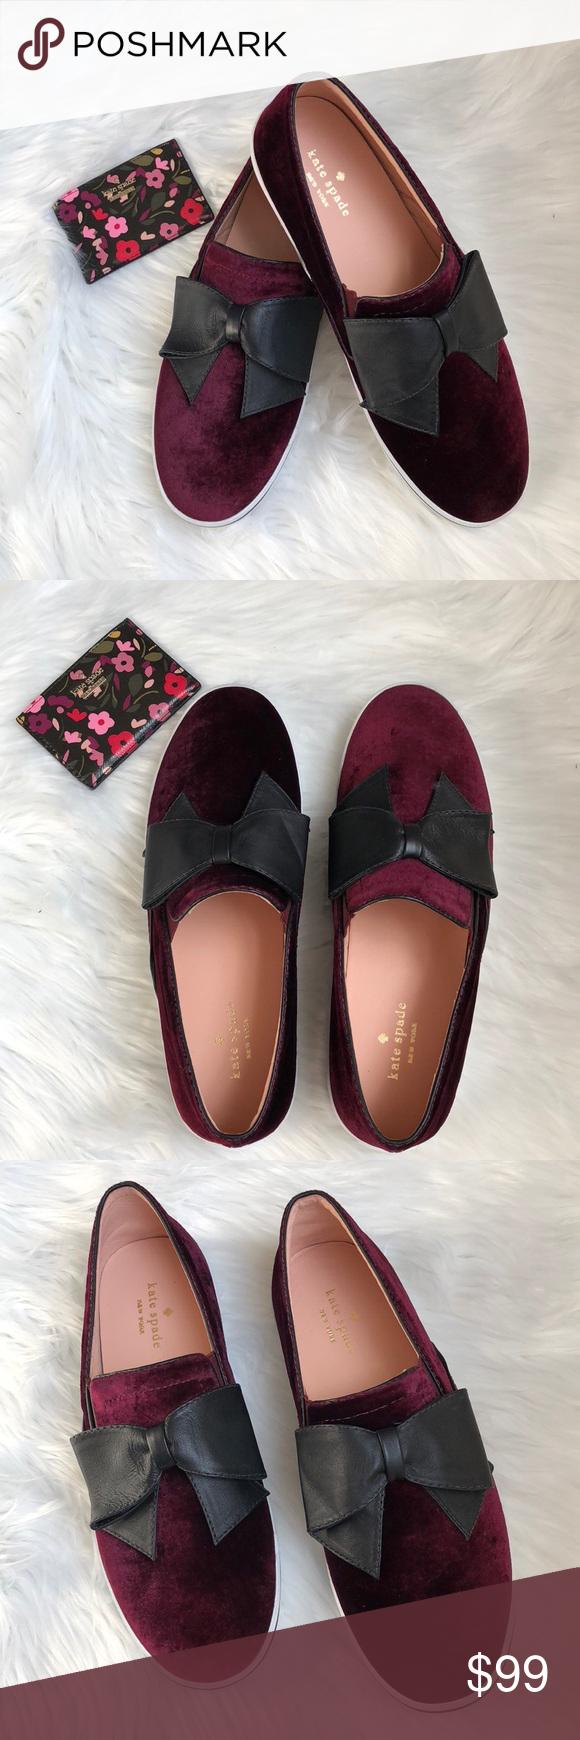 kate spade burgundy shoes